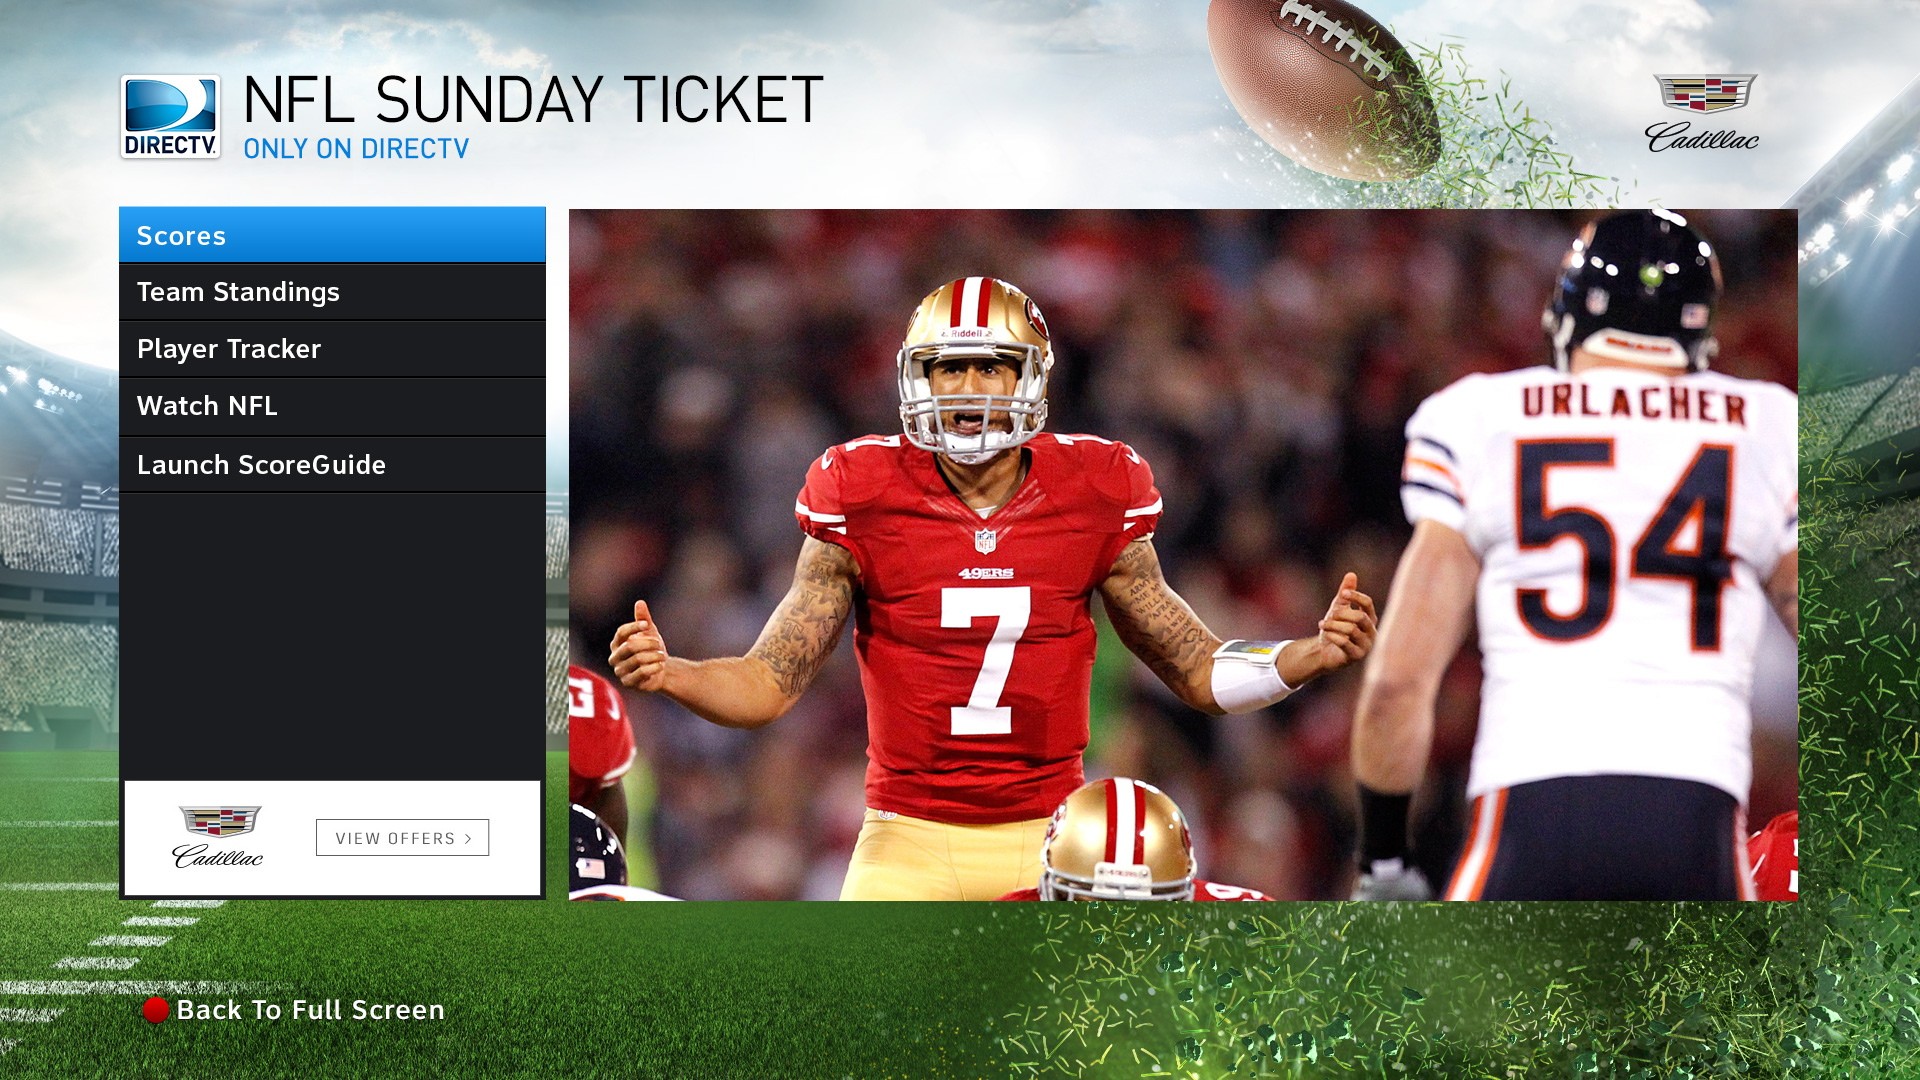 NFLST15_Main_Screen_sponsors_Cadillac_cl.jpg